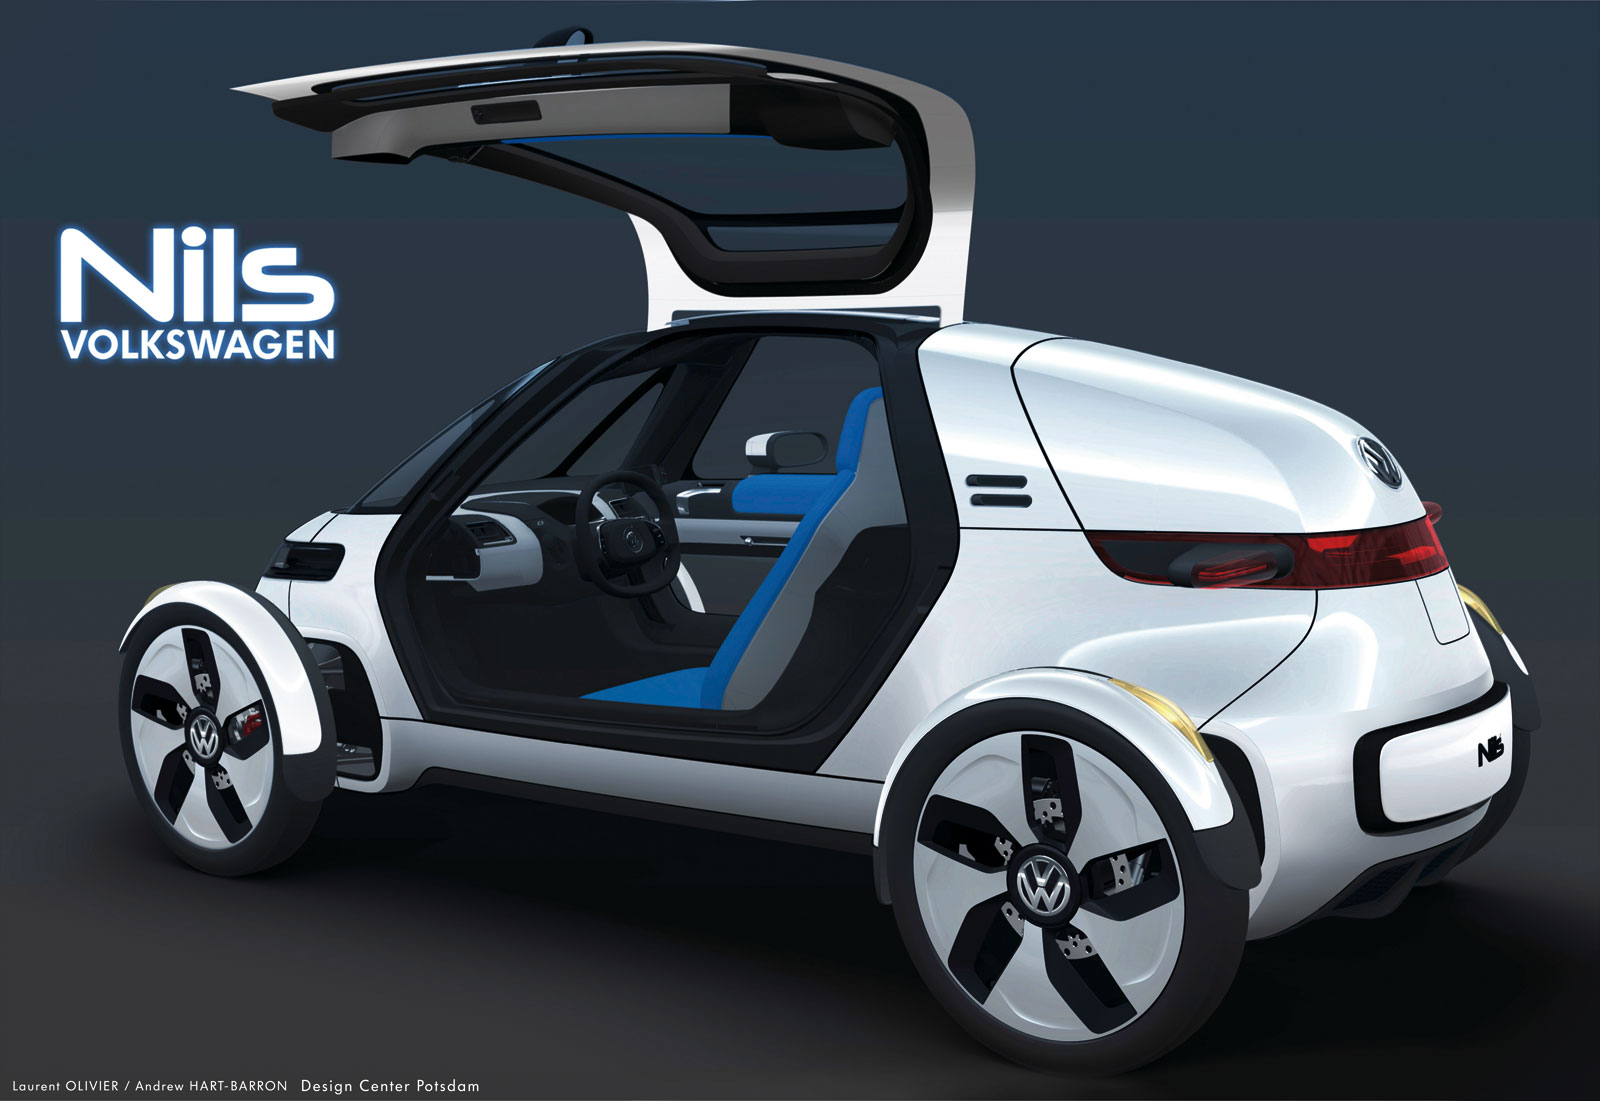 La volkswagen nils concept